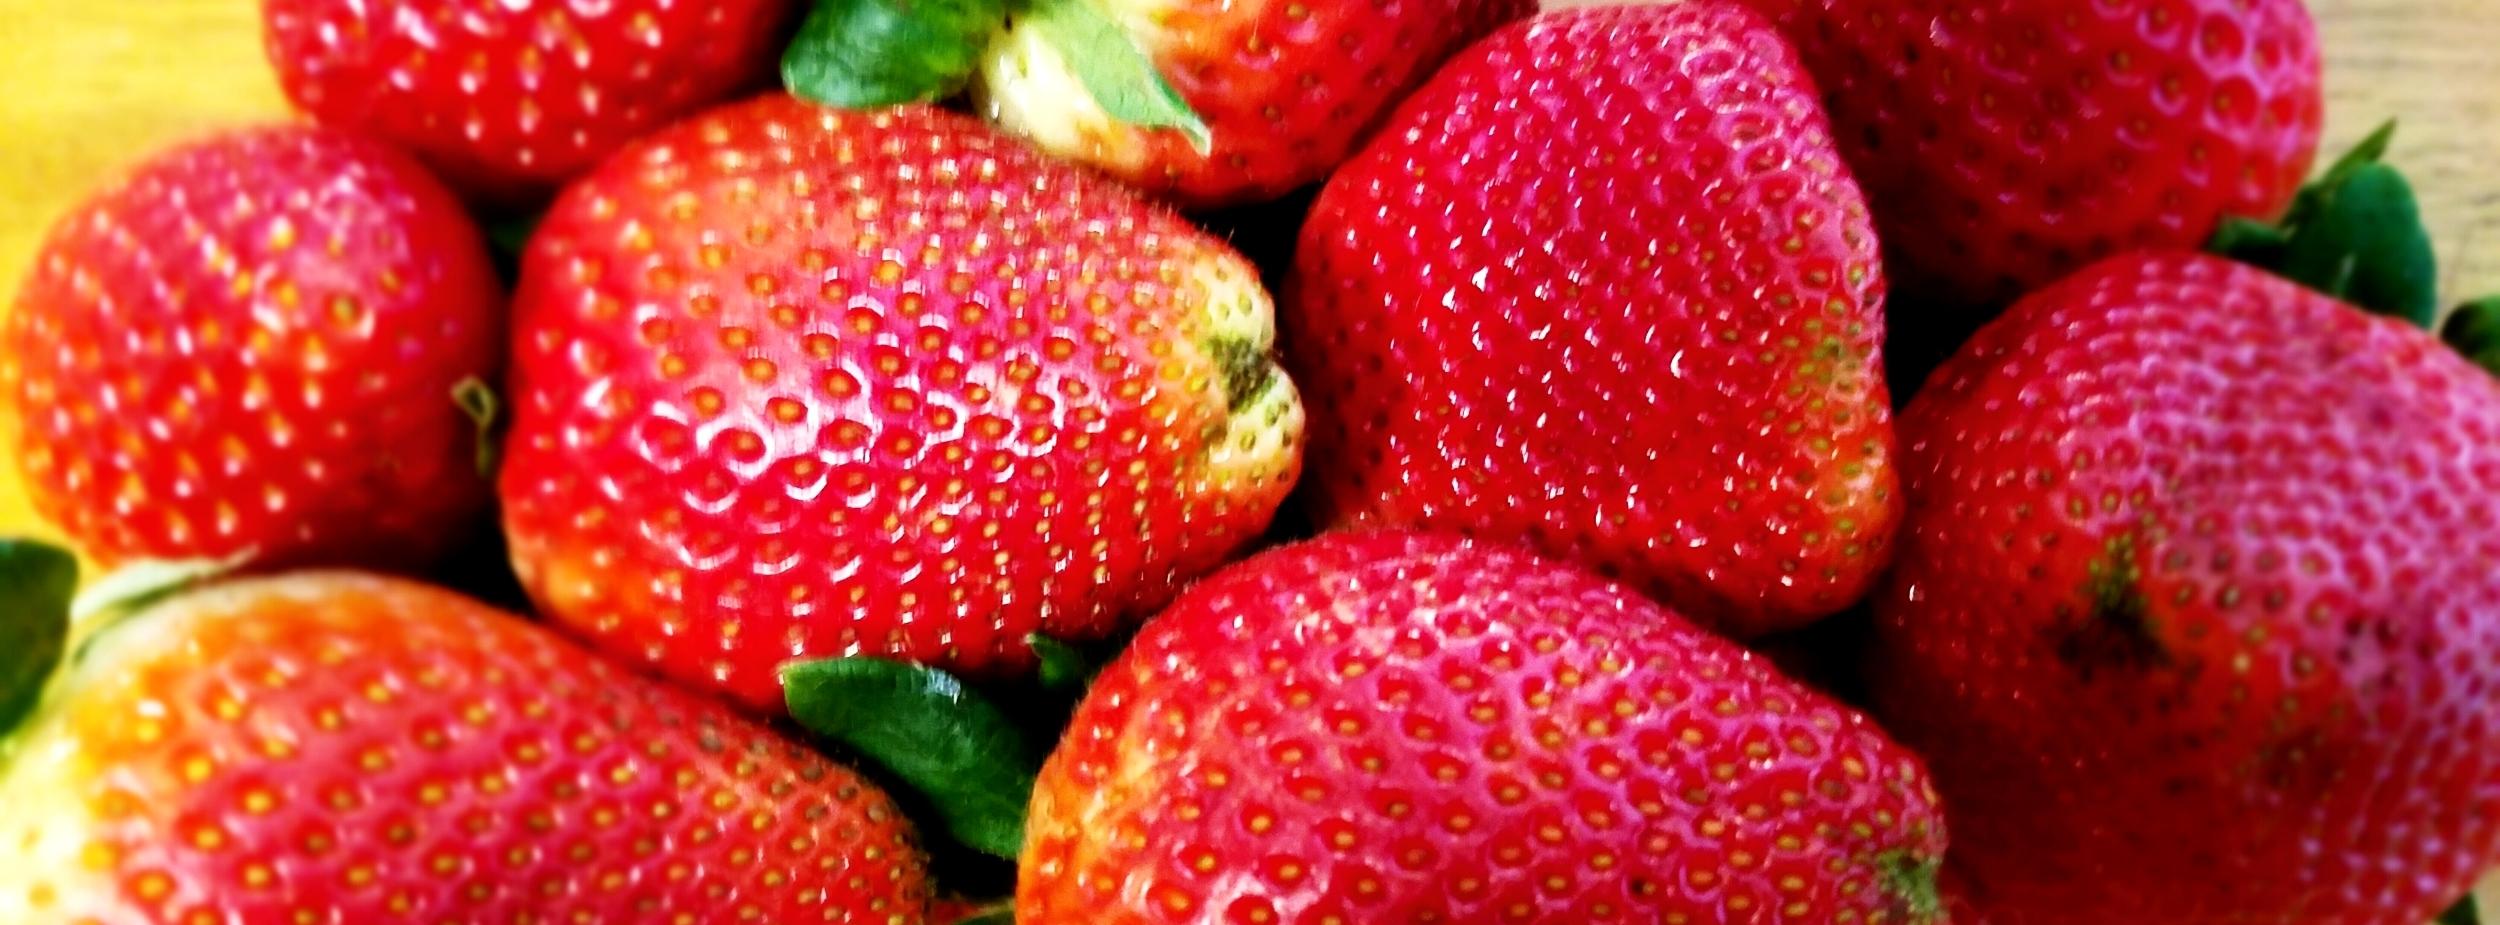 Strawberry-Avocado Dagwood